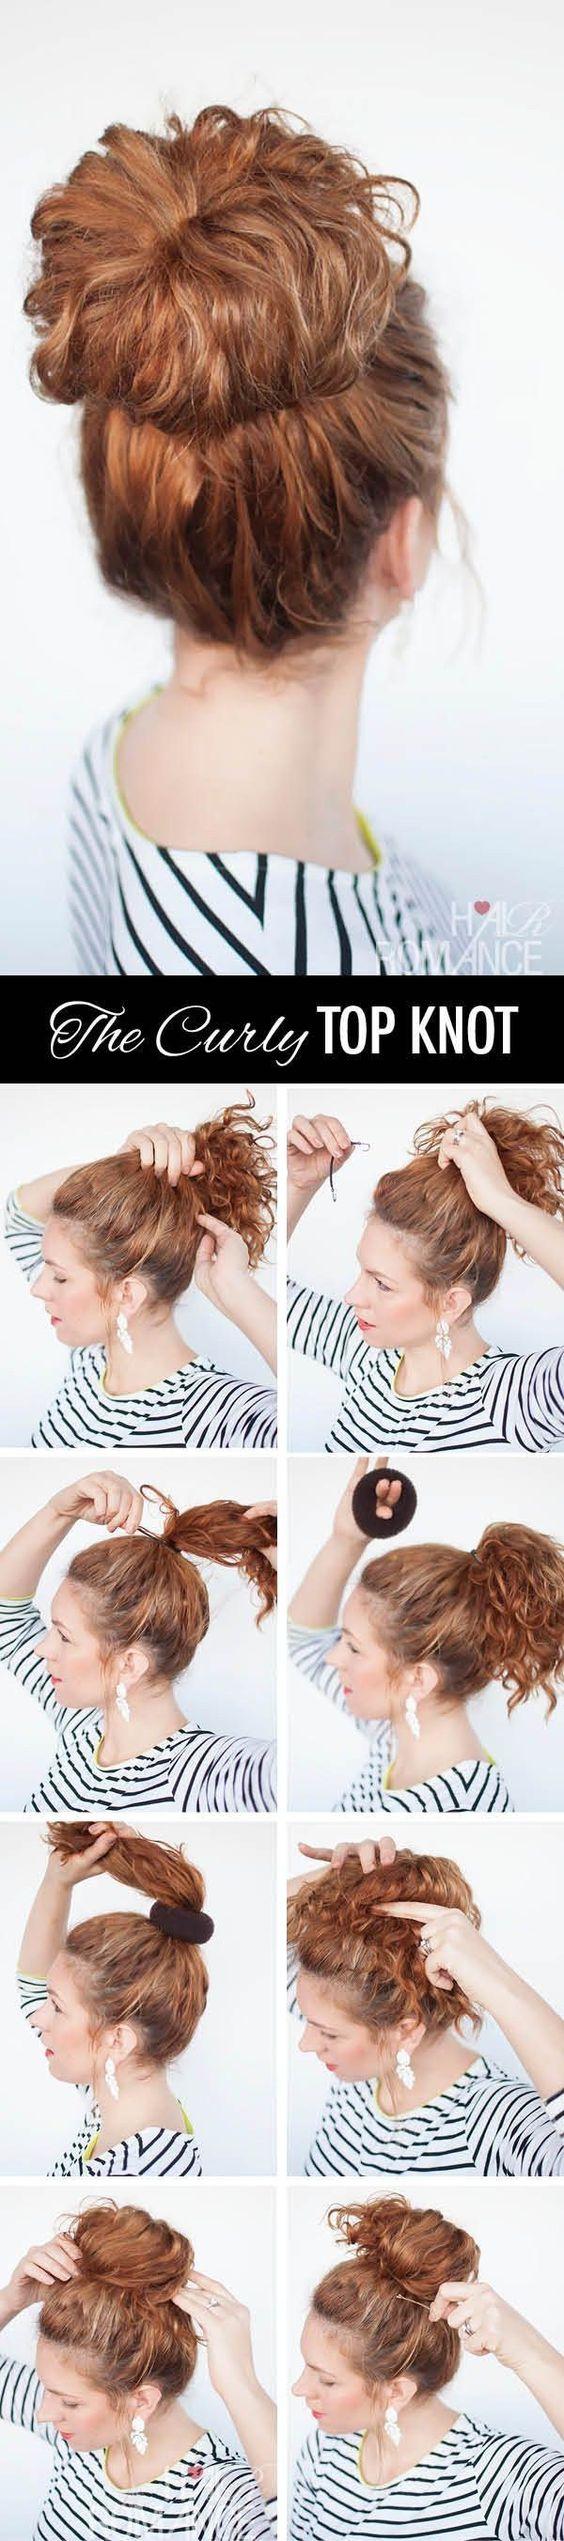 tutorial-cabelo-ondulado: